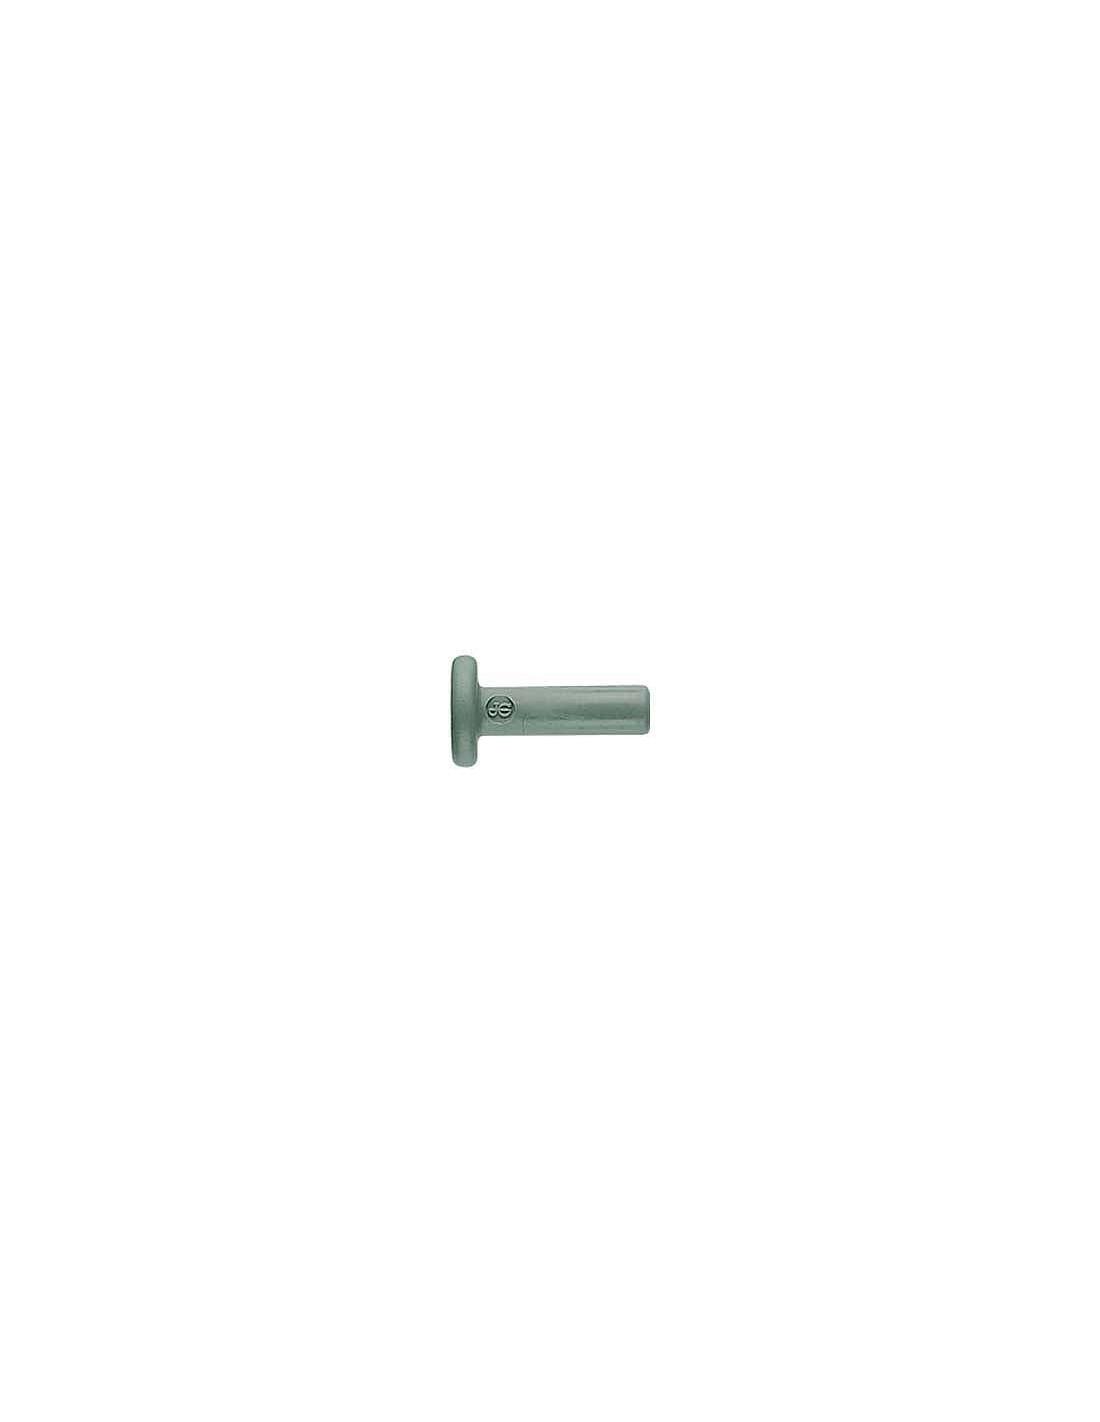 "UPP00052 - JG plugg 8 mm (5/16"") (pm0808s)"